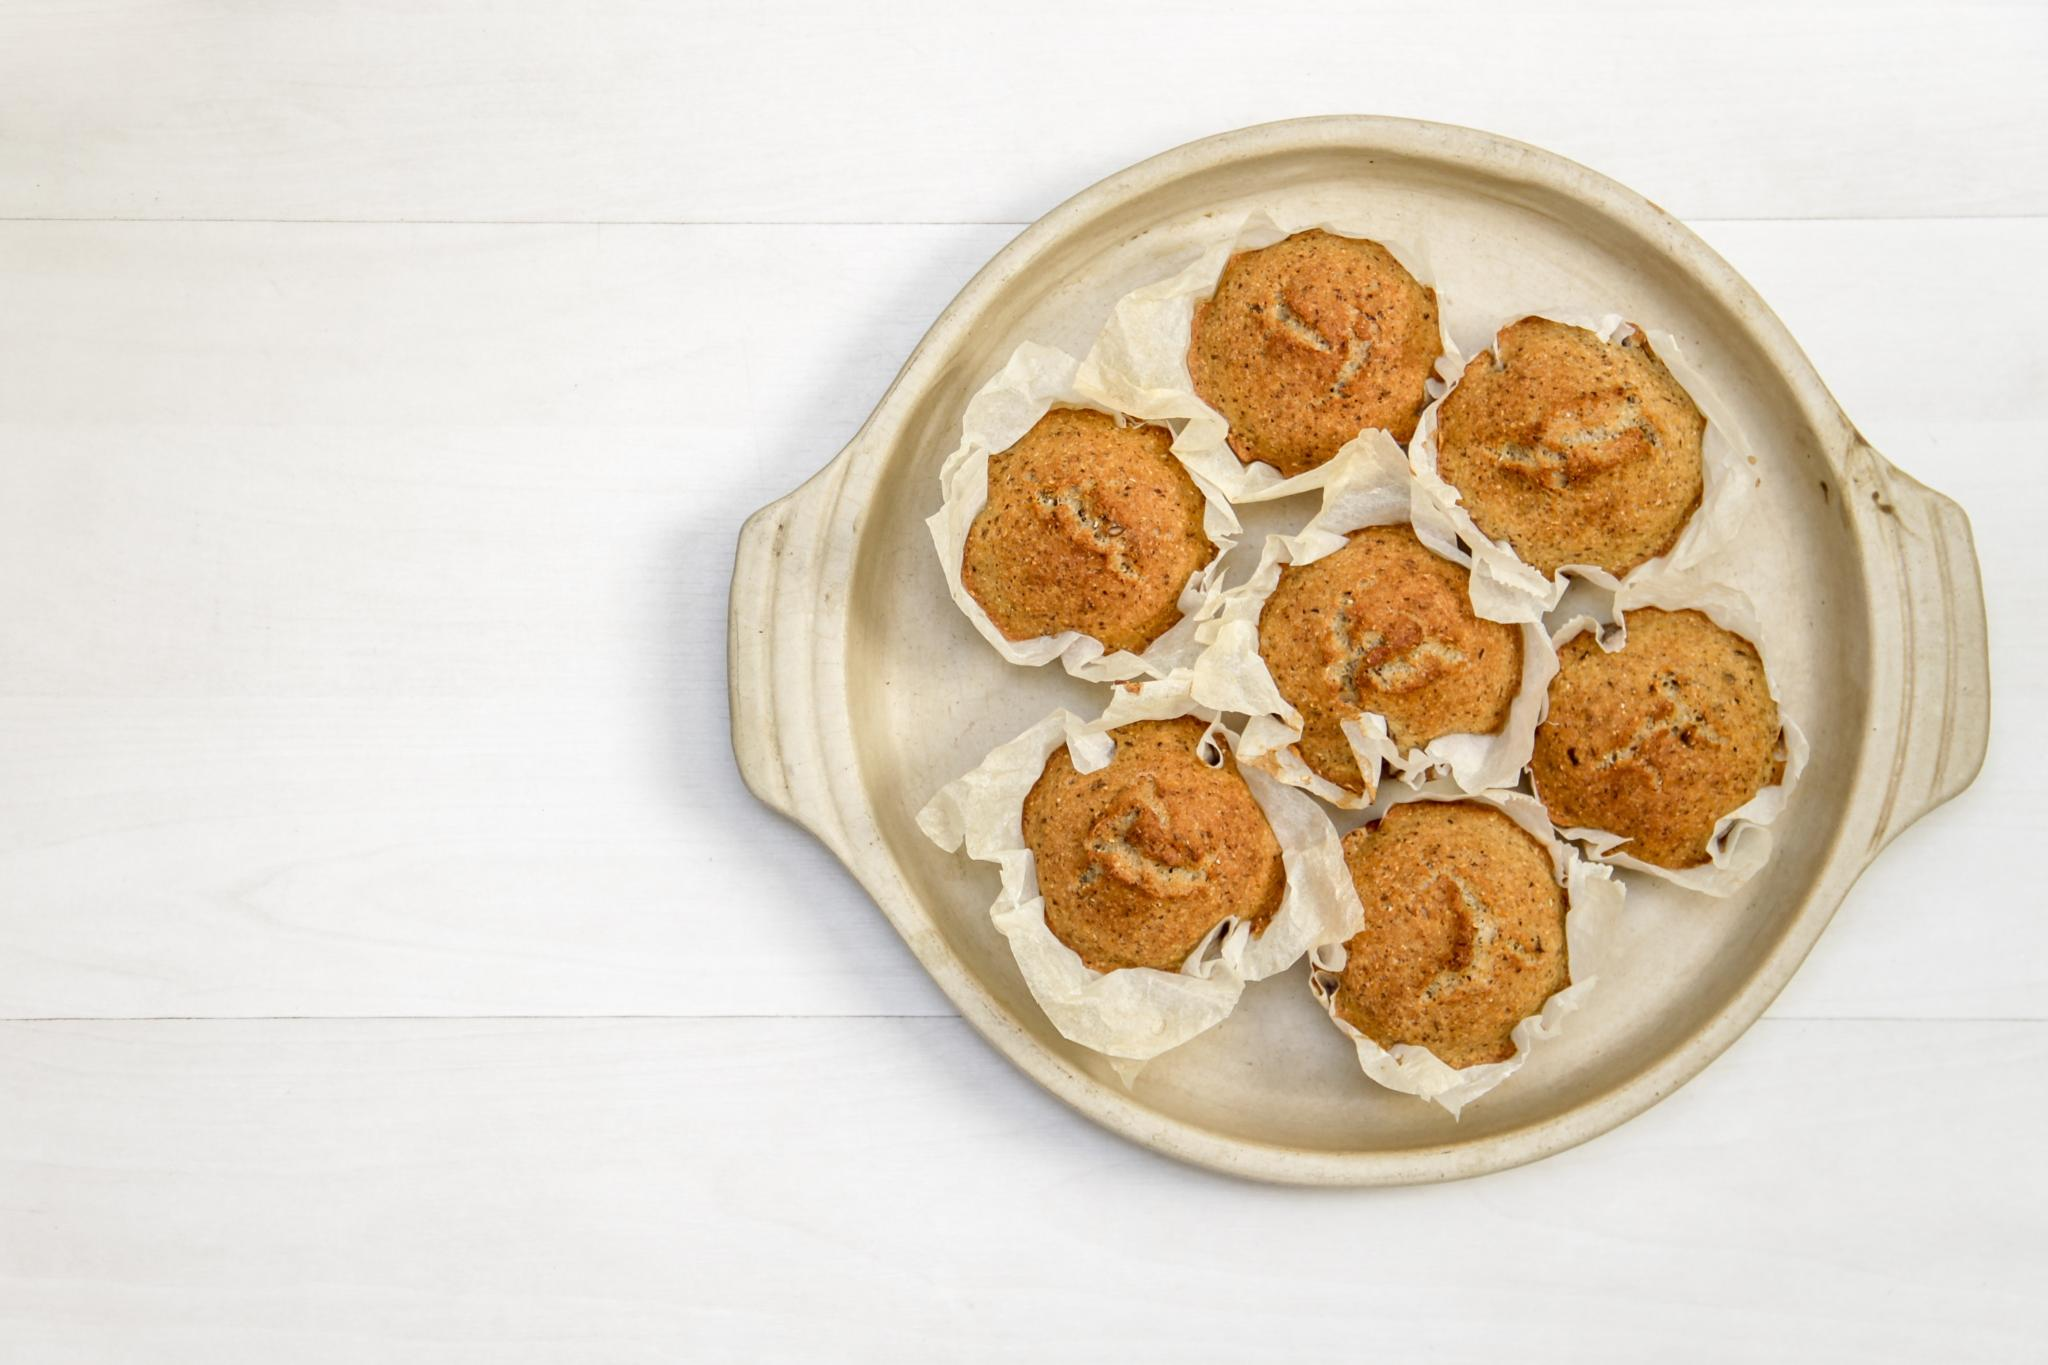 Easy Gluten-Free Banana Mini Muffins